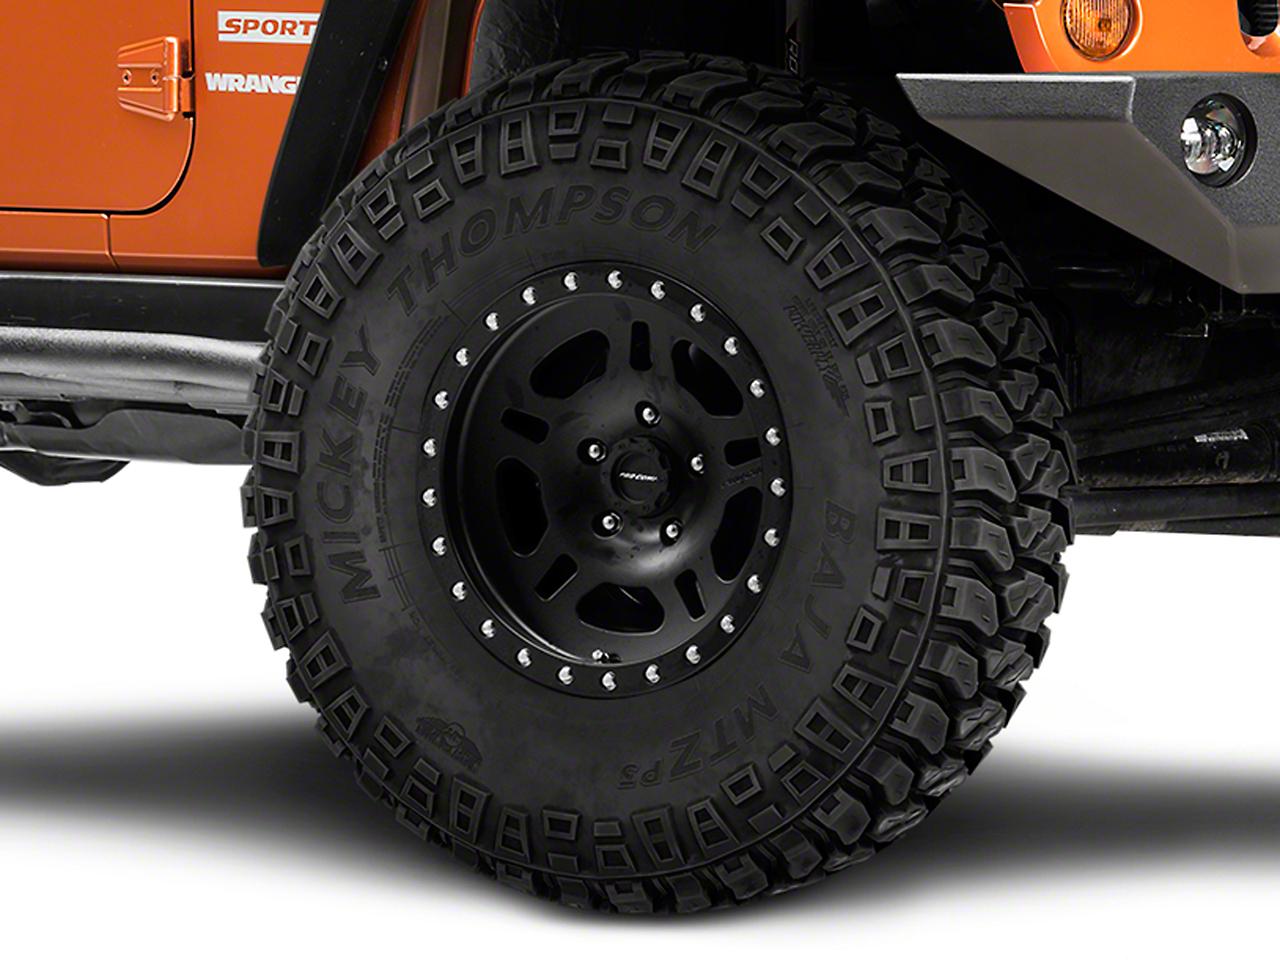 Pro Comp La Paz Series 29 Satin Black Wheel - 16x8 (07-18 Jeep Wrangler JK; 2018 Jeep Wrangler JL)